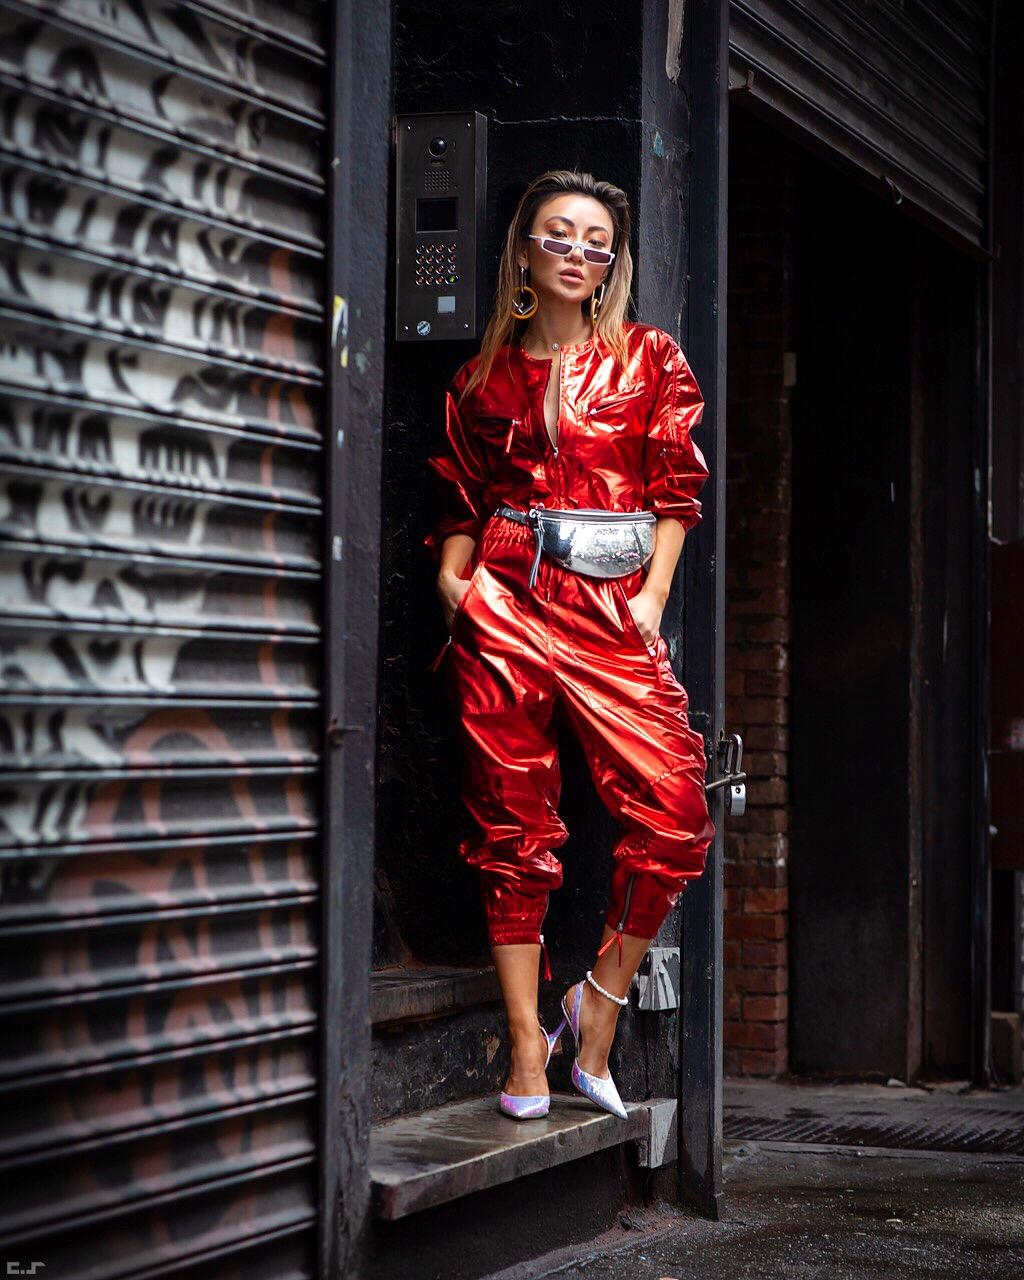 boiler suit trend, boiler suit fall 2019, boiler suit and boots, NYFW SS19 Recap, NYFW SS19 Street Style, holographic trend, metallic trend // Notjessfashion.com